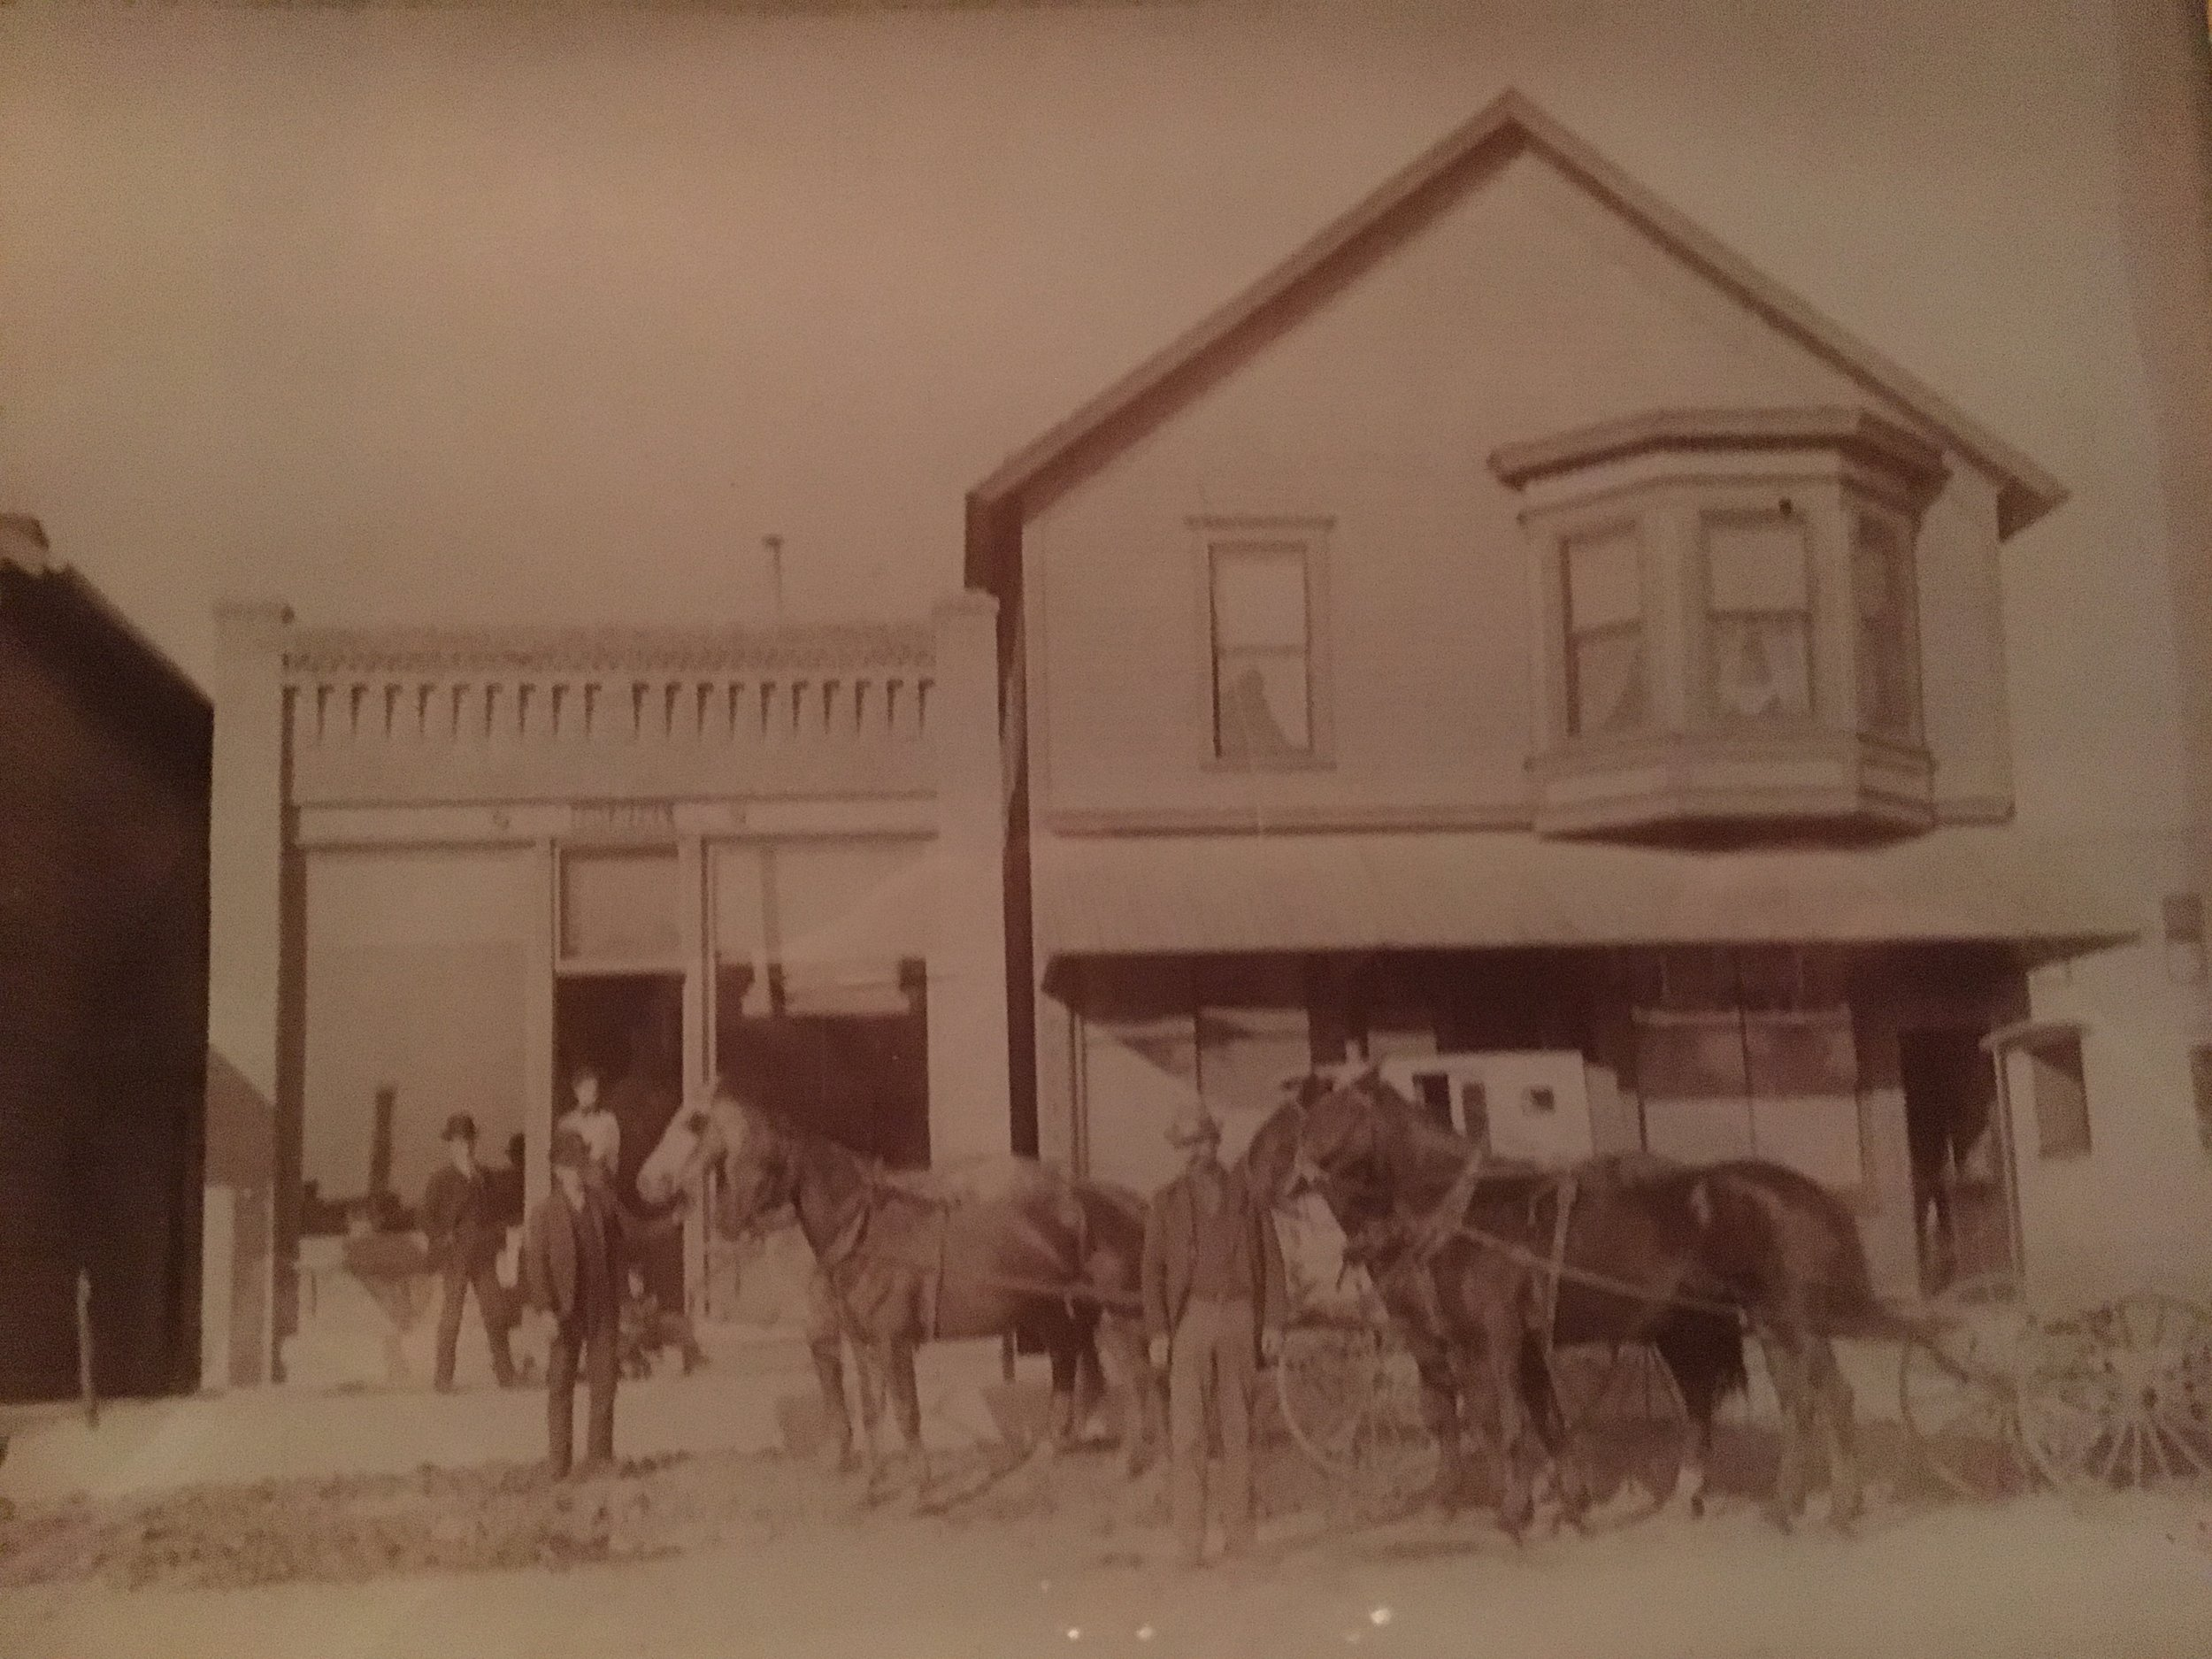 Grant Park Post office 1906